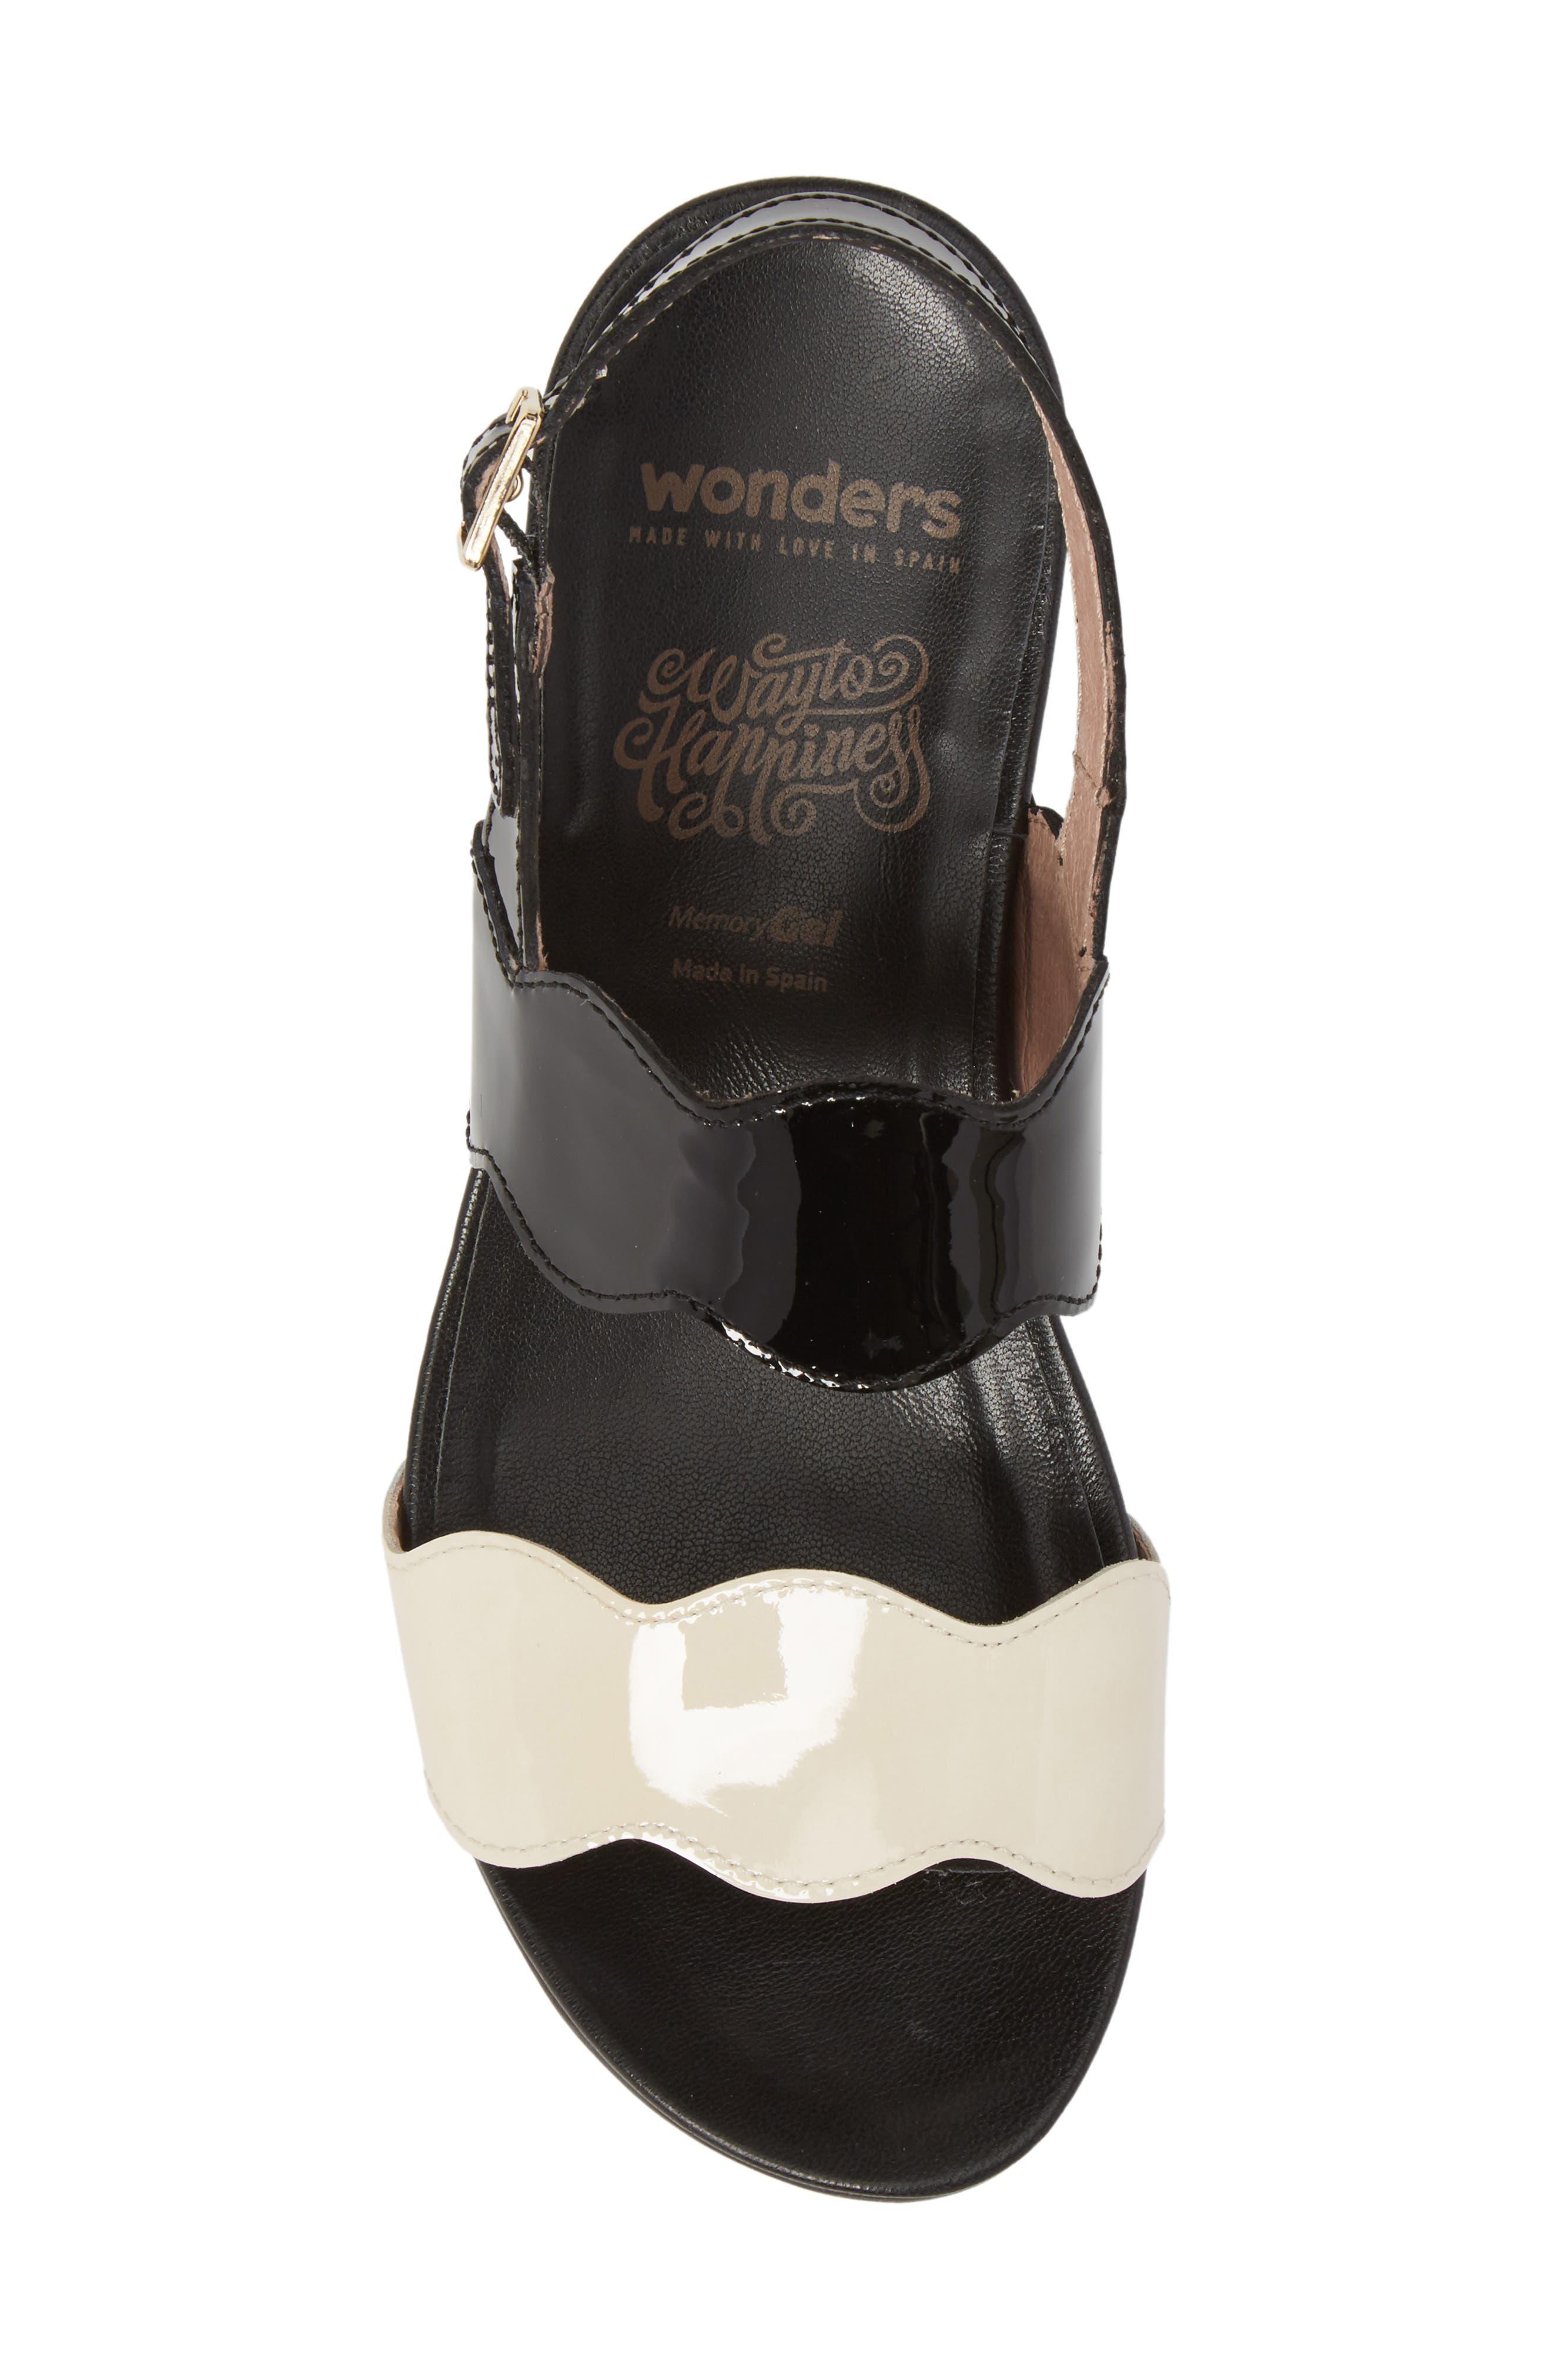 Wedge Sandal,                             Alternate thumbnail 5, color,                             Black/ Off Leather